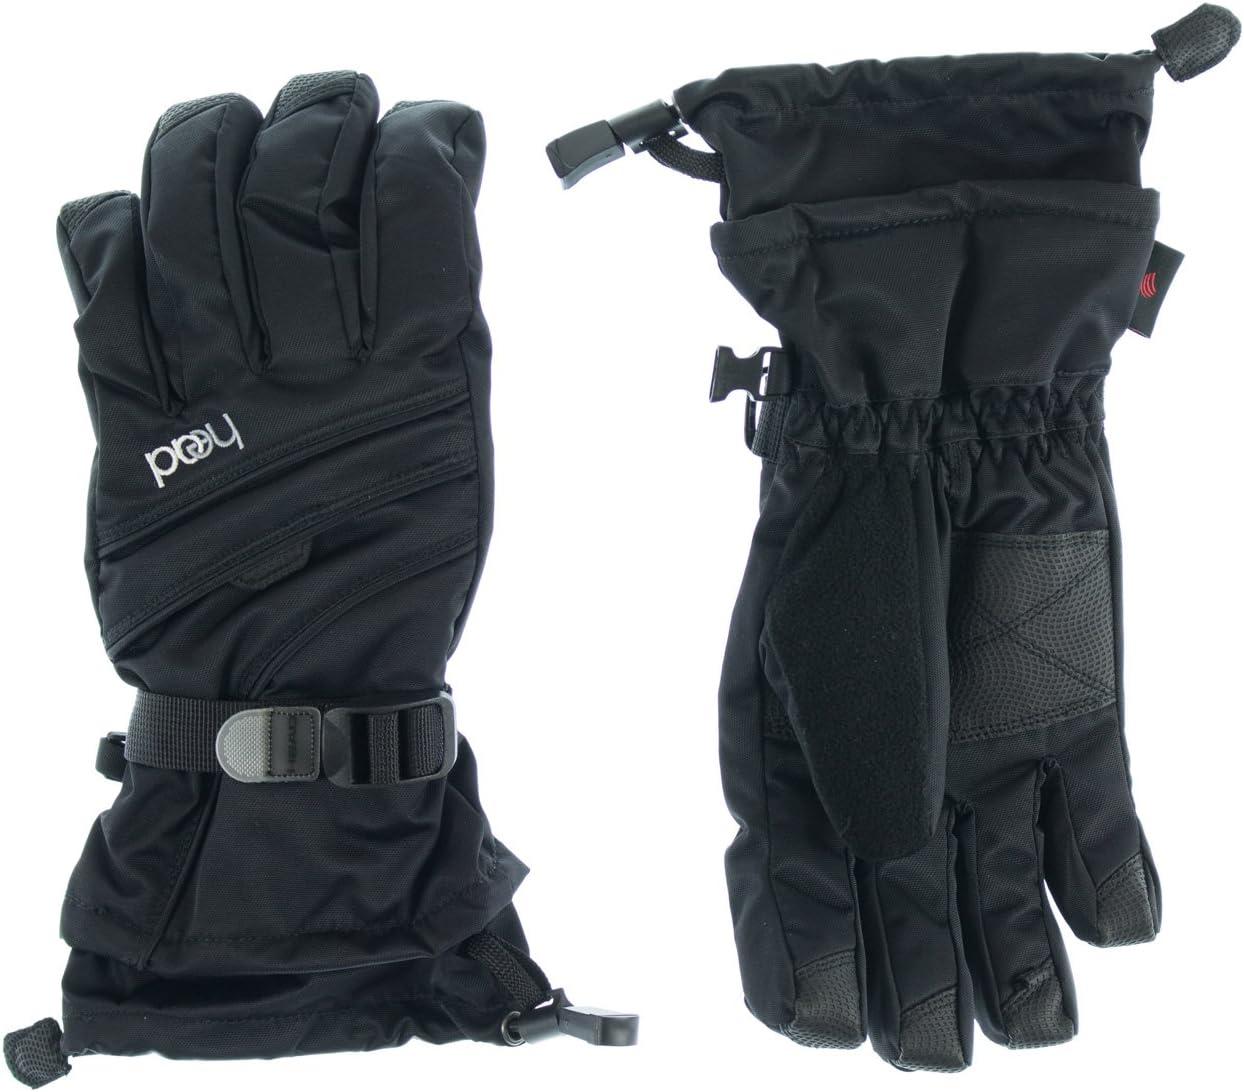 Head WaterProof low-pricing DuPont Gloves Sorona Max 51% OFF